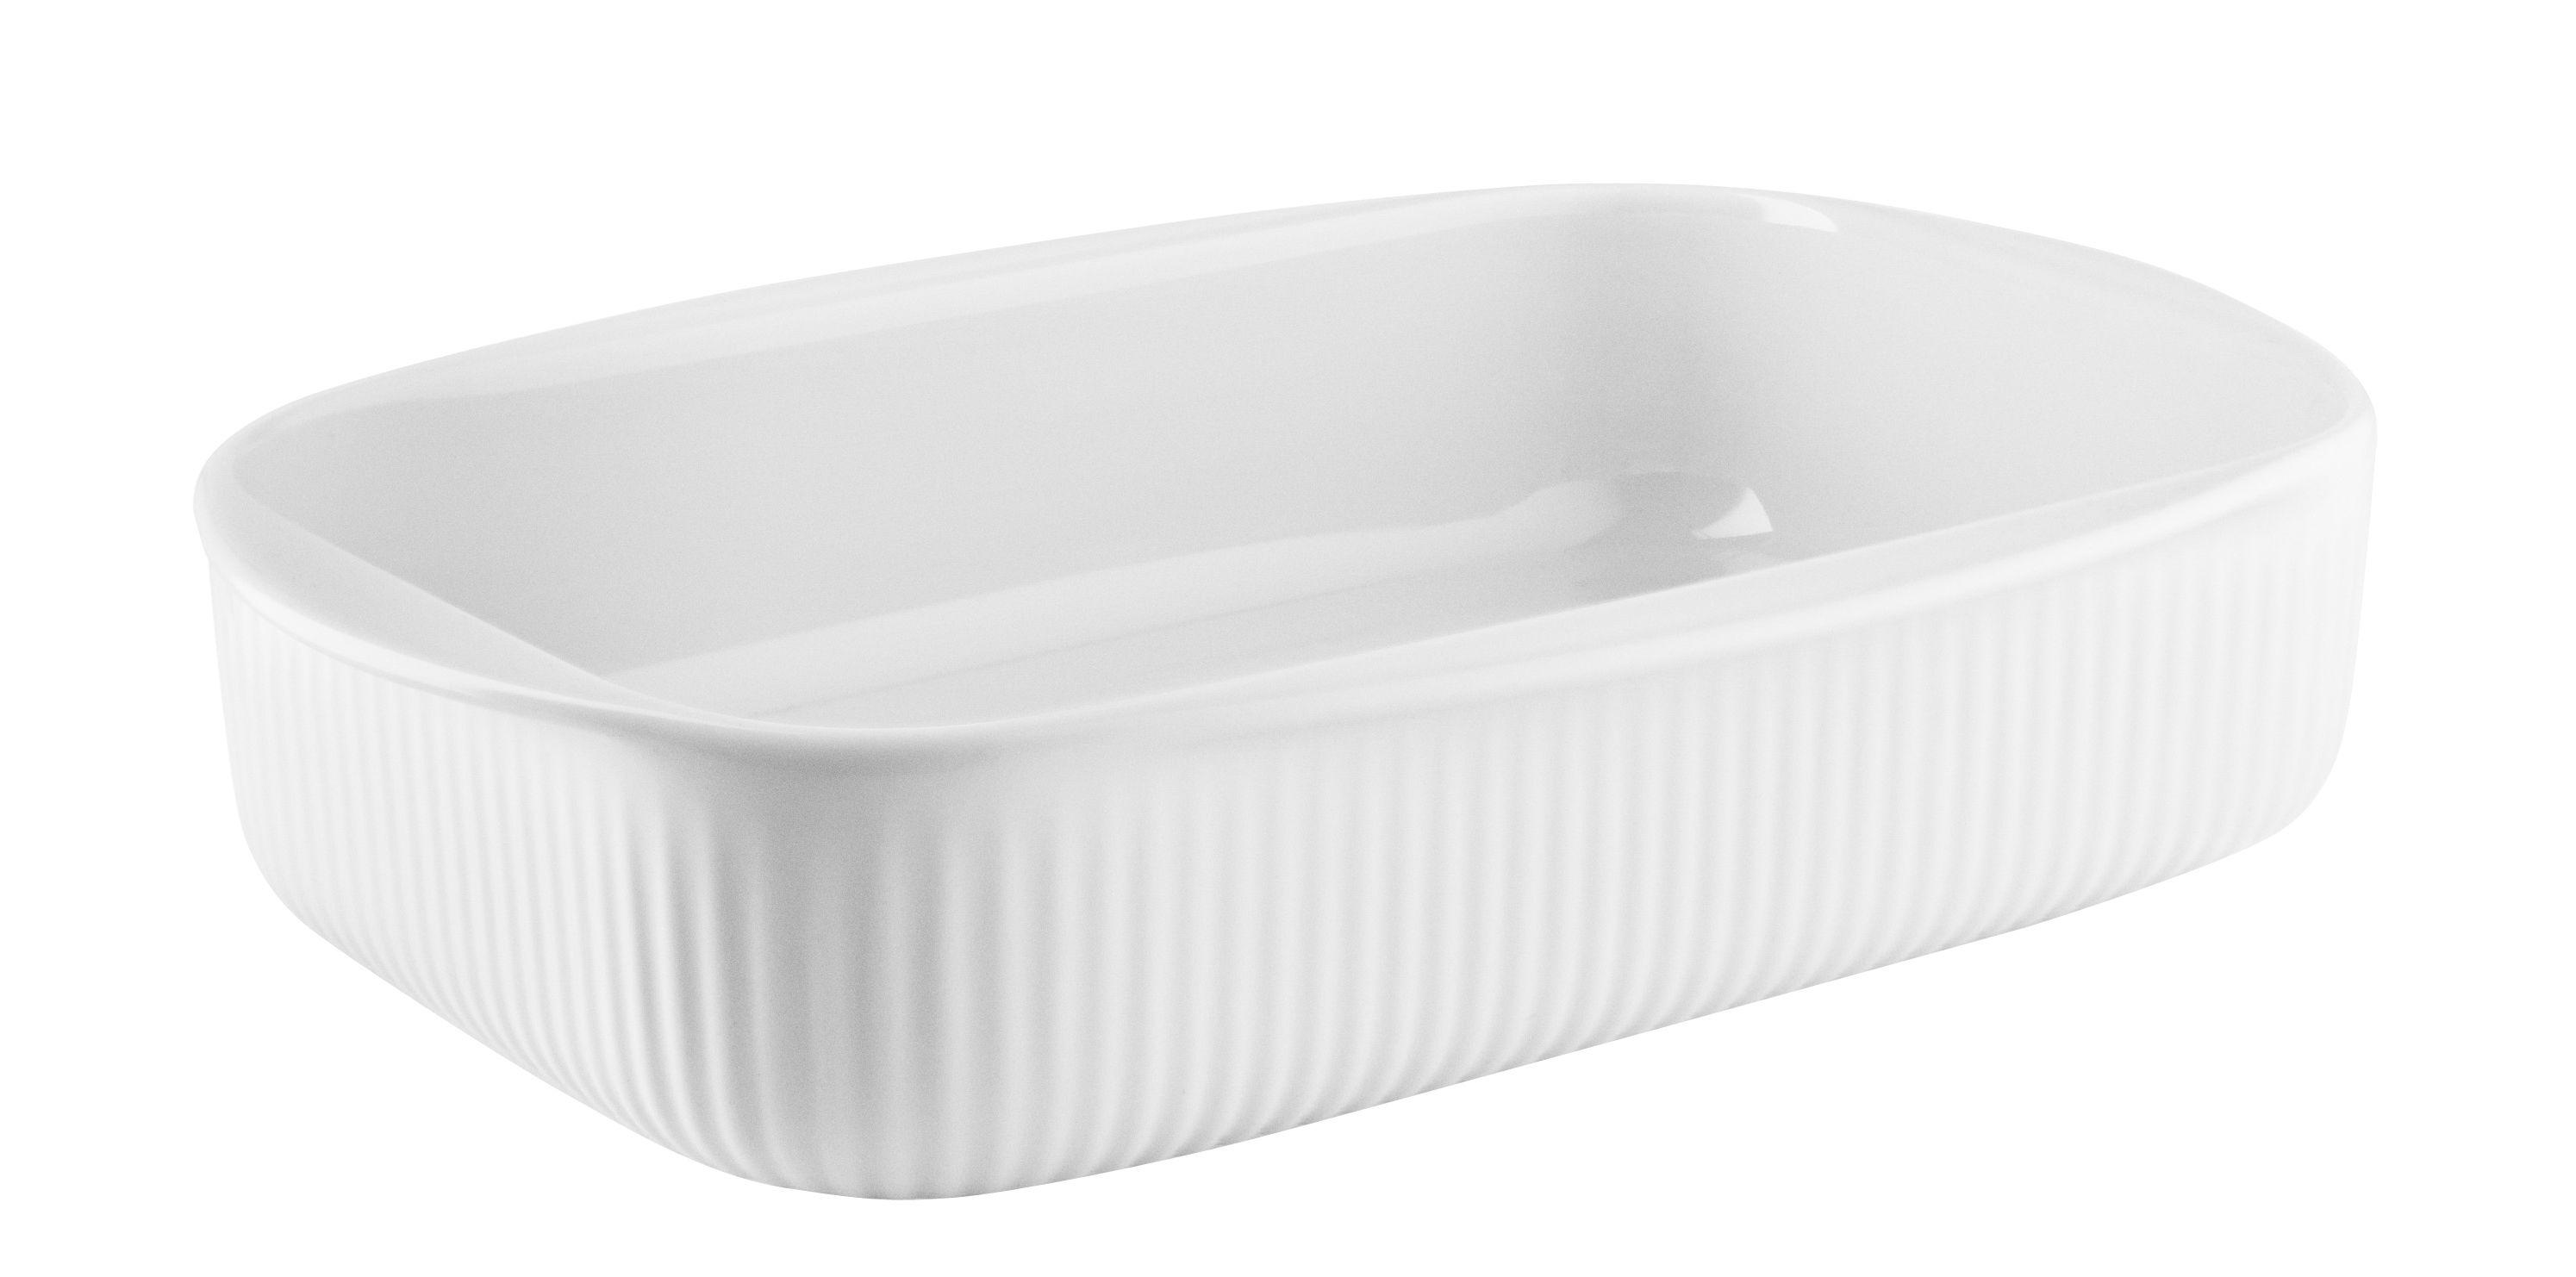 Tableware - Serving Plates - Legio Nova Baking dish - / Small - 24 x 16.5 cm by Eva Trio - Small / White - China